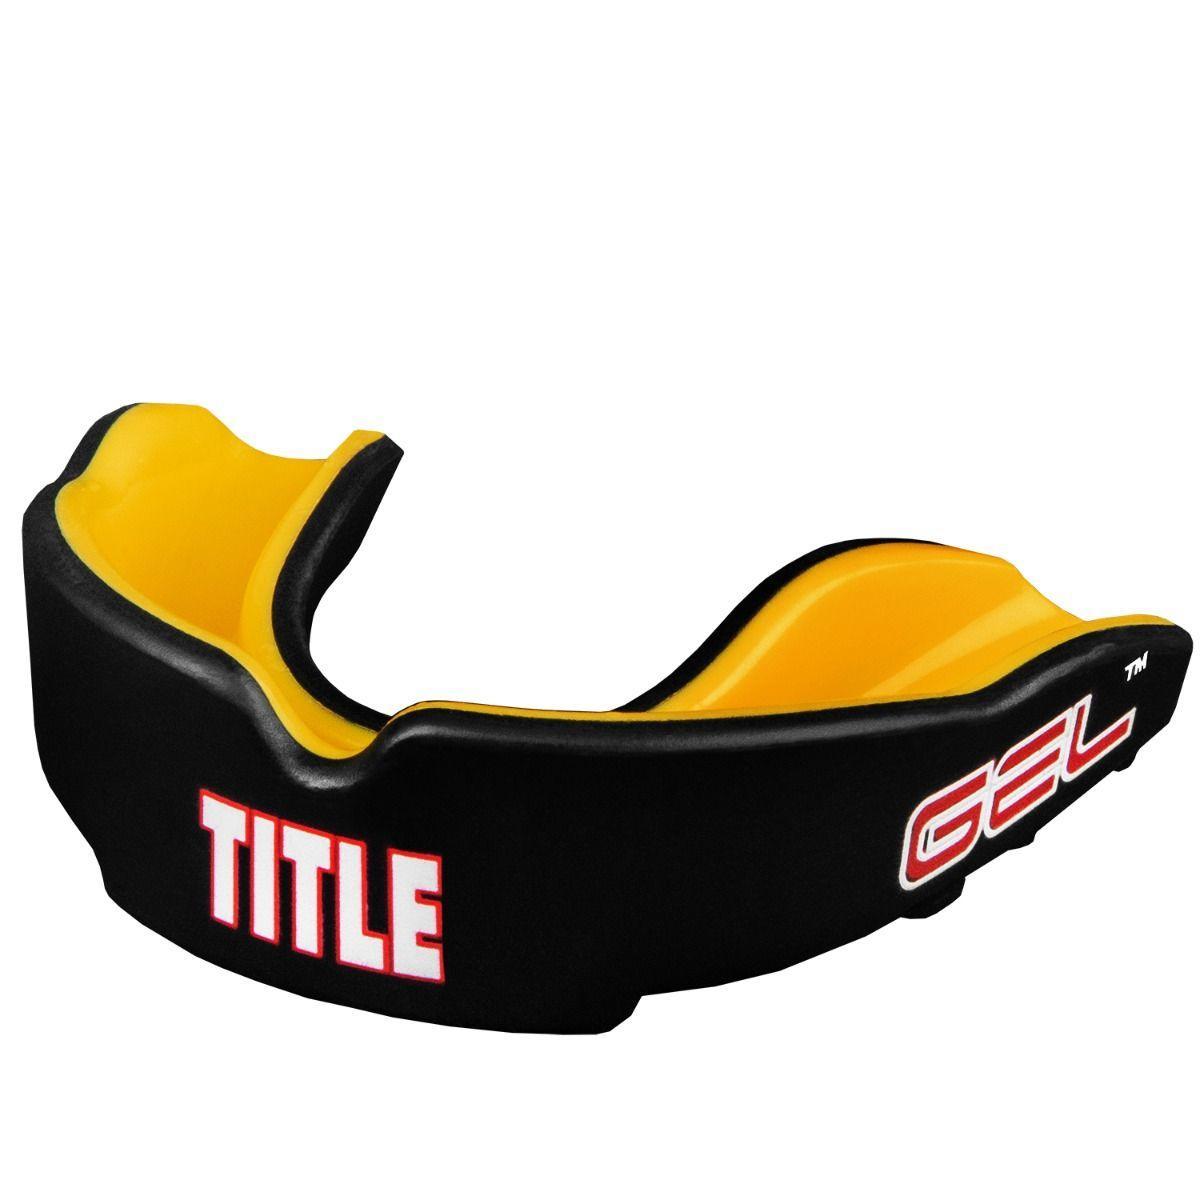 Капа боксерская TITLE Gel Victory Черная с желтым (Для взрослых)